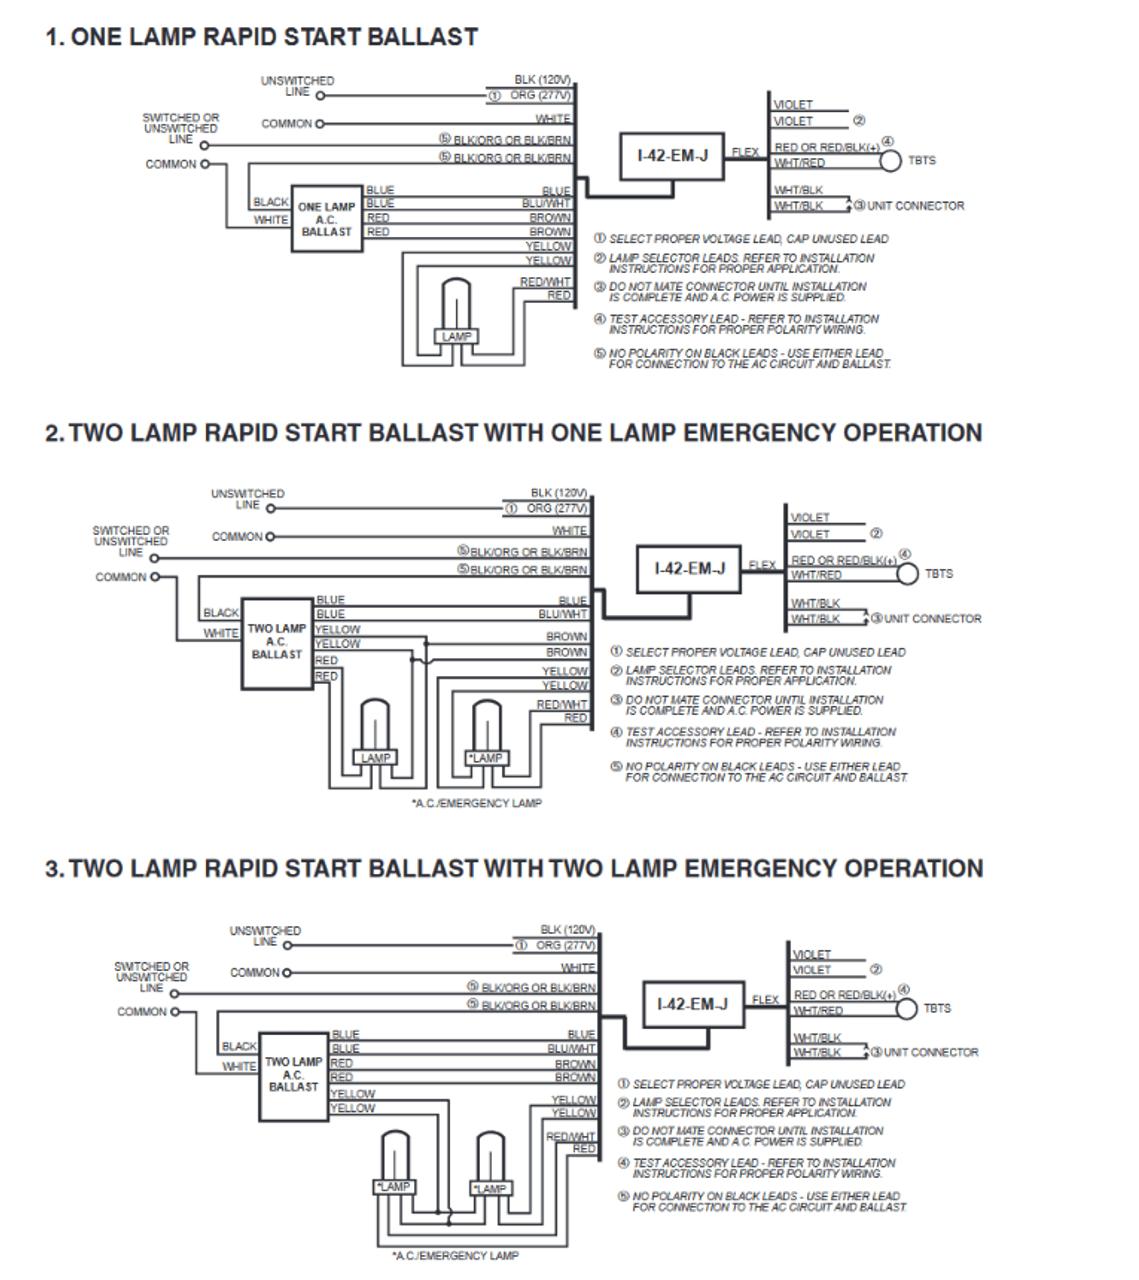 iota emergency ballast wiring diagram lamp on fluorescent light fixture wiring diagram  [ 1139 x 1280 Pixel ]